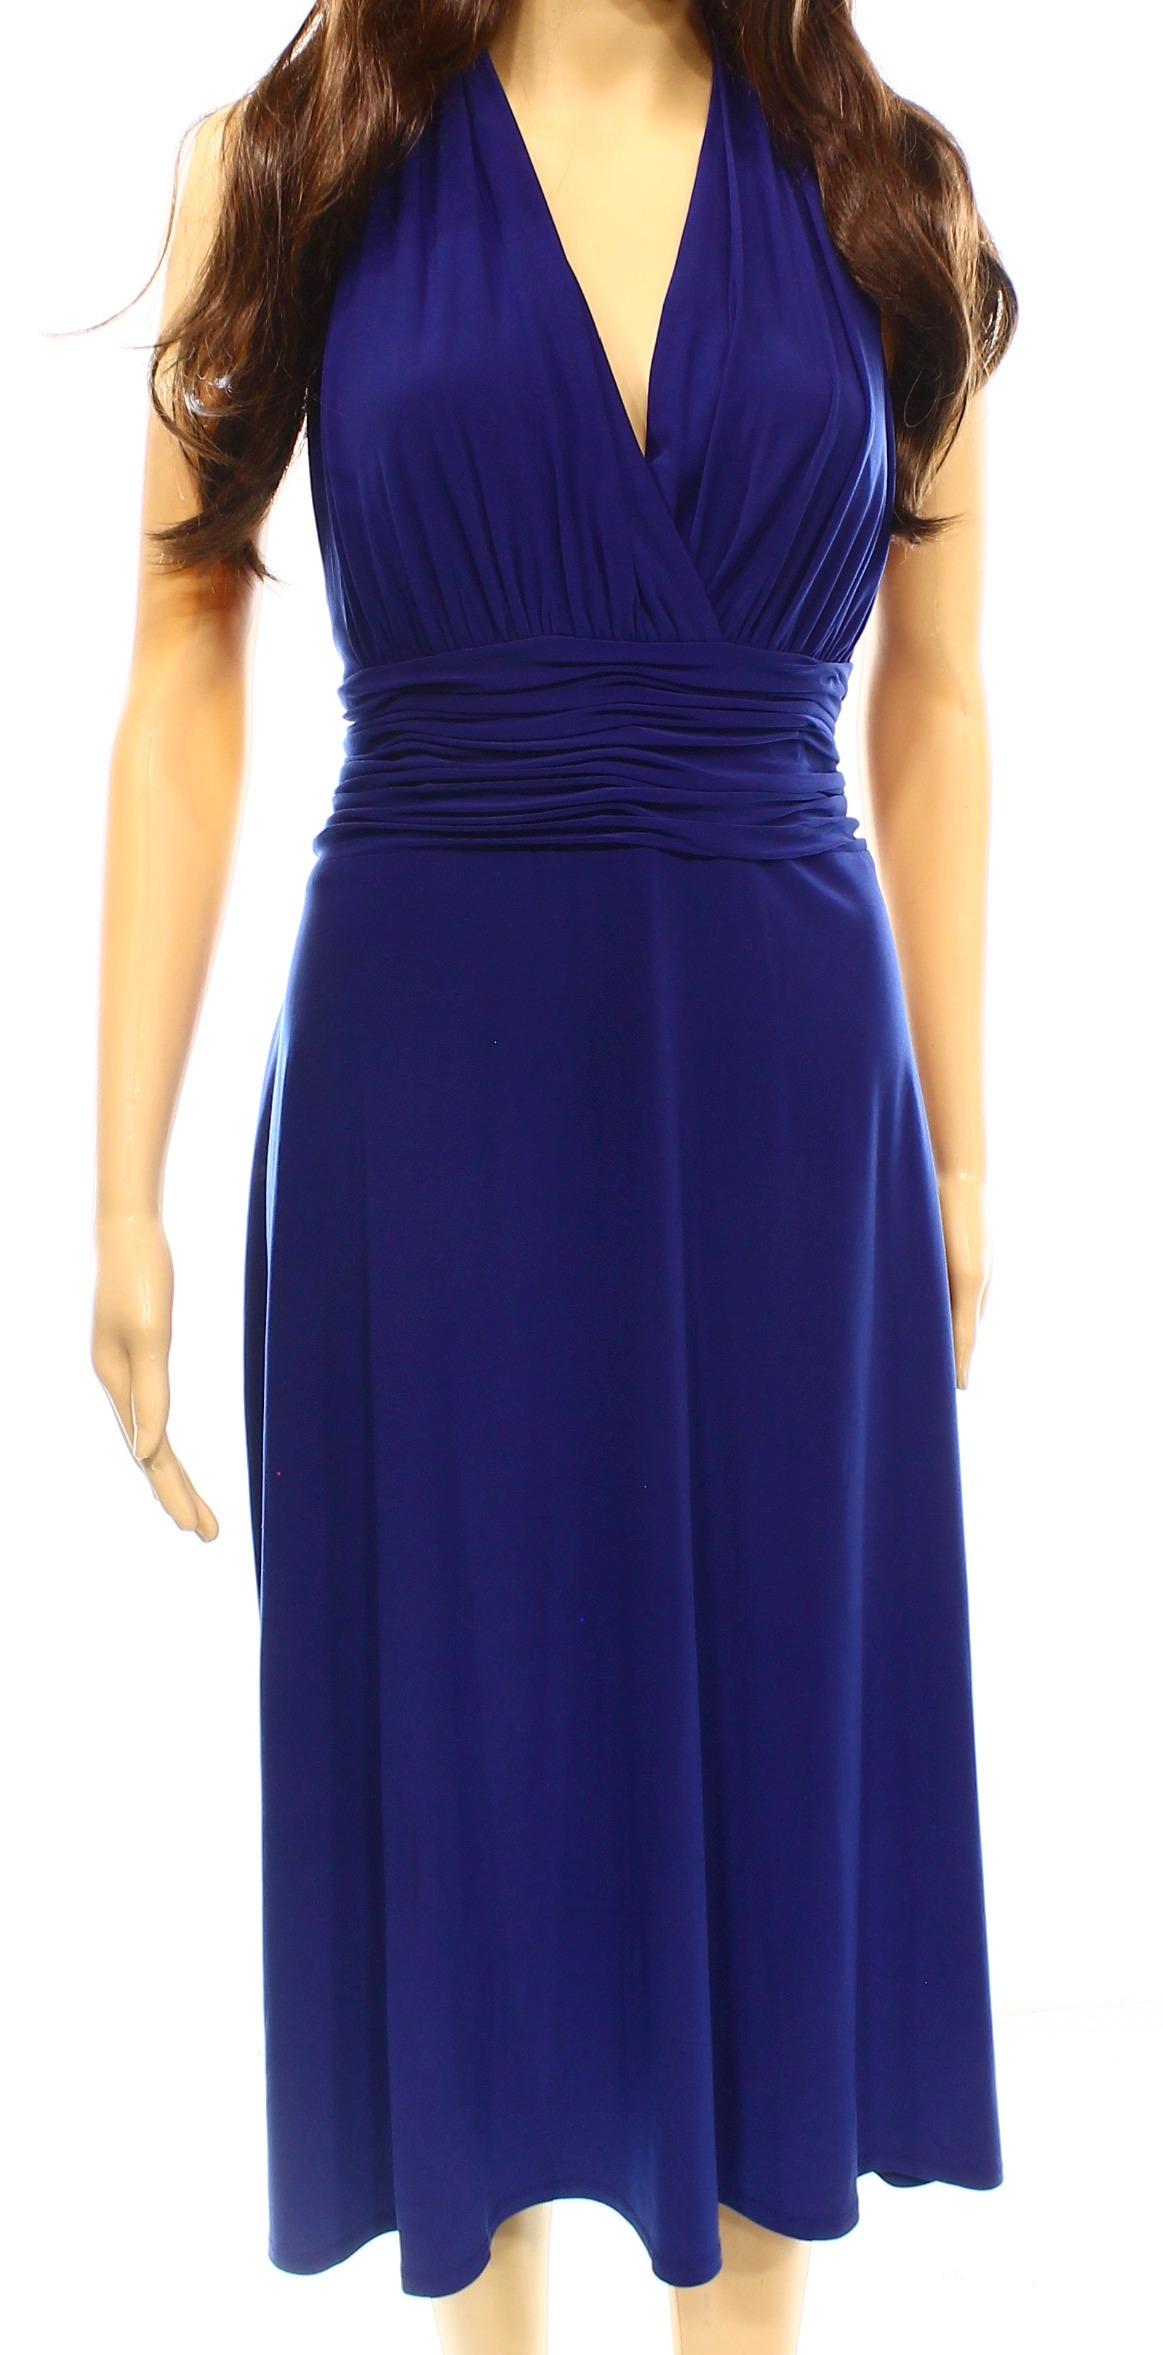 Departments also evan picone new blue ruched surplice women   size rh walmart